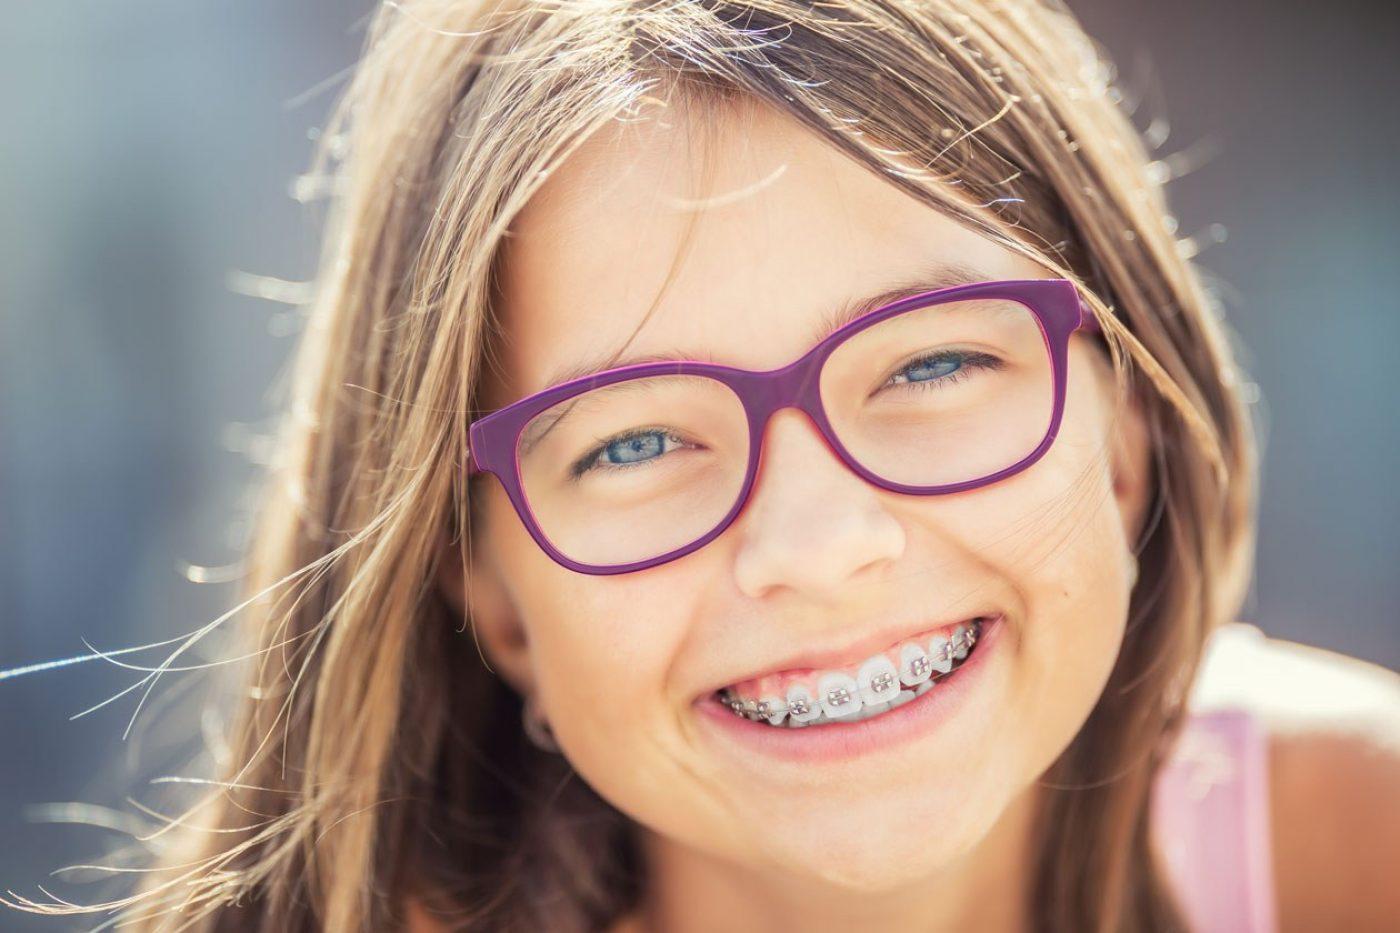 Orthodontics Childrens Braces Uppingham Dental Implant Clinic